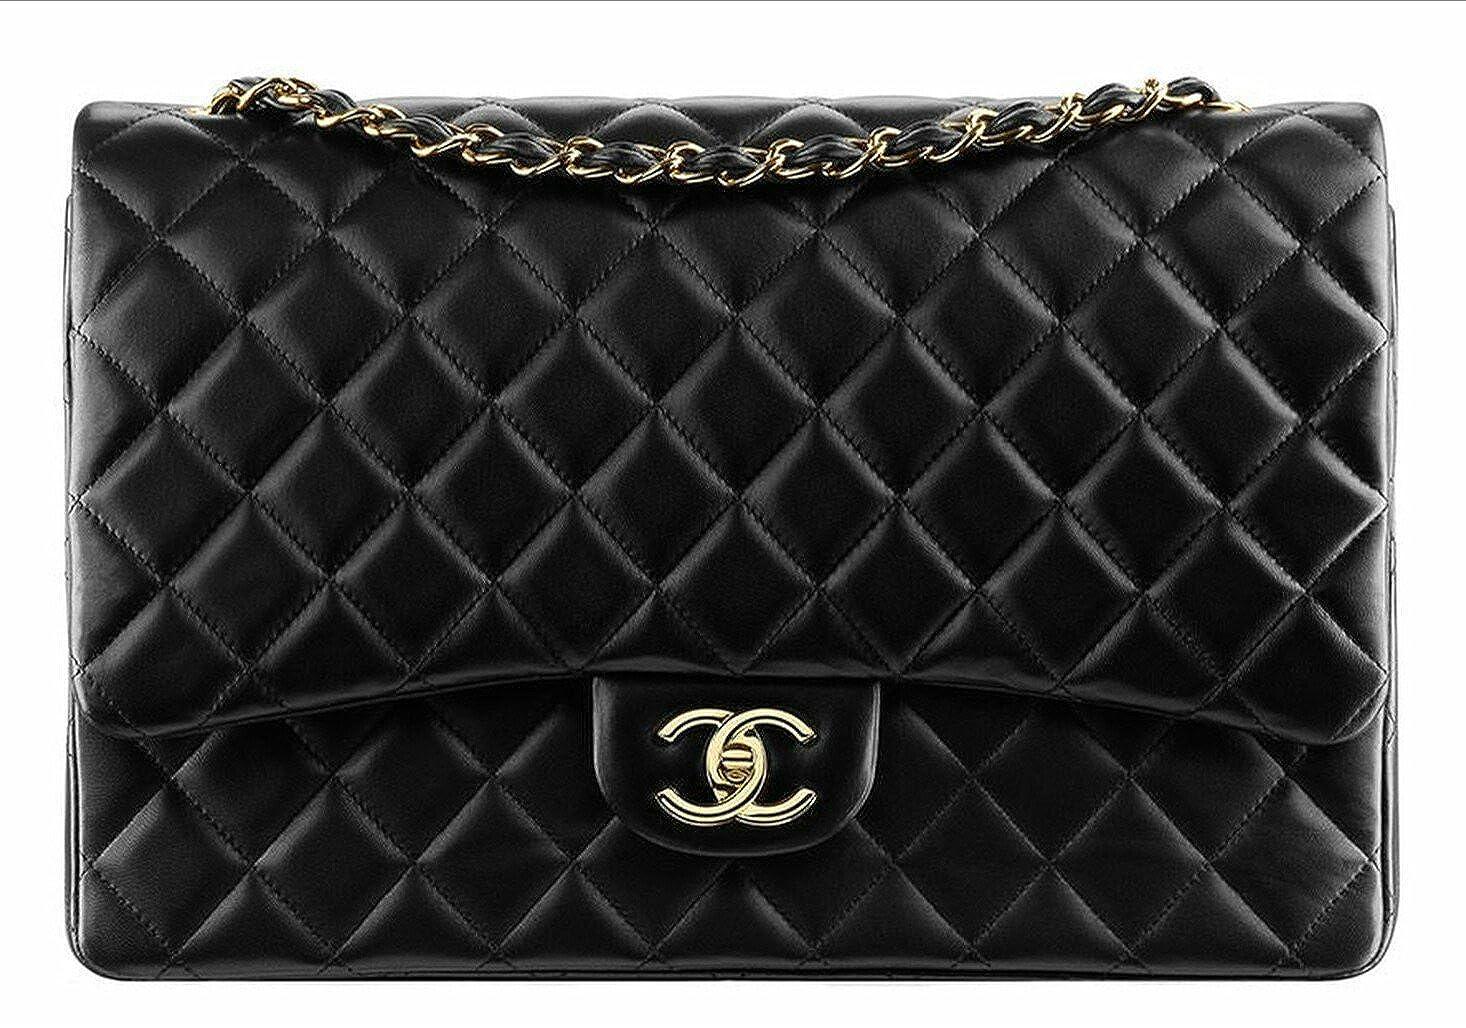 4139a41d0421 CHANEL Jumbo Lambskin Classic Double Flap Bag: Amazon.co.uk: Shoes & Bags